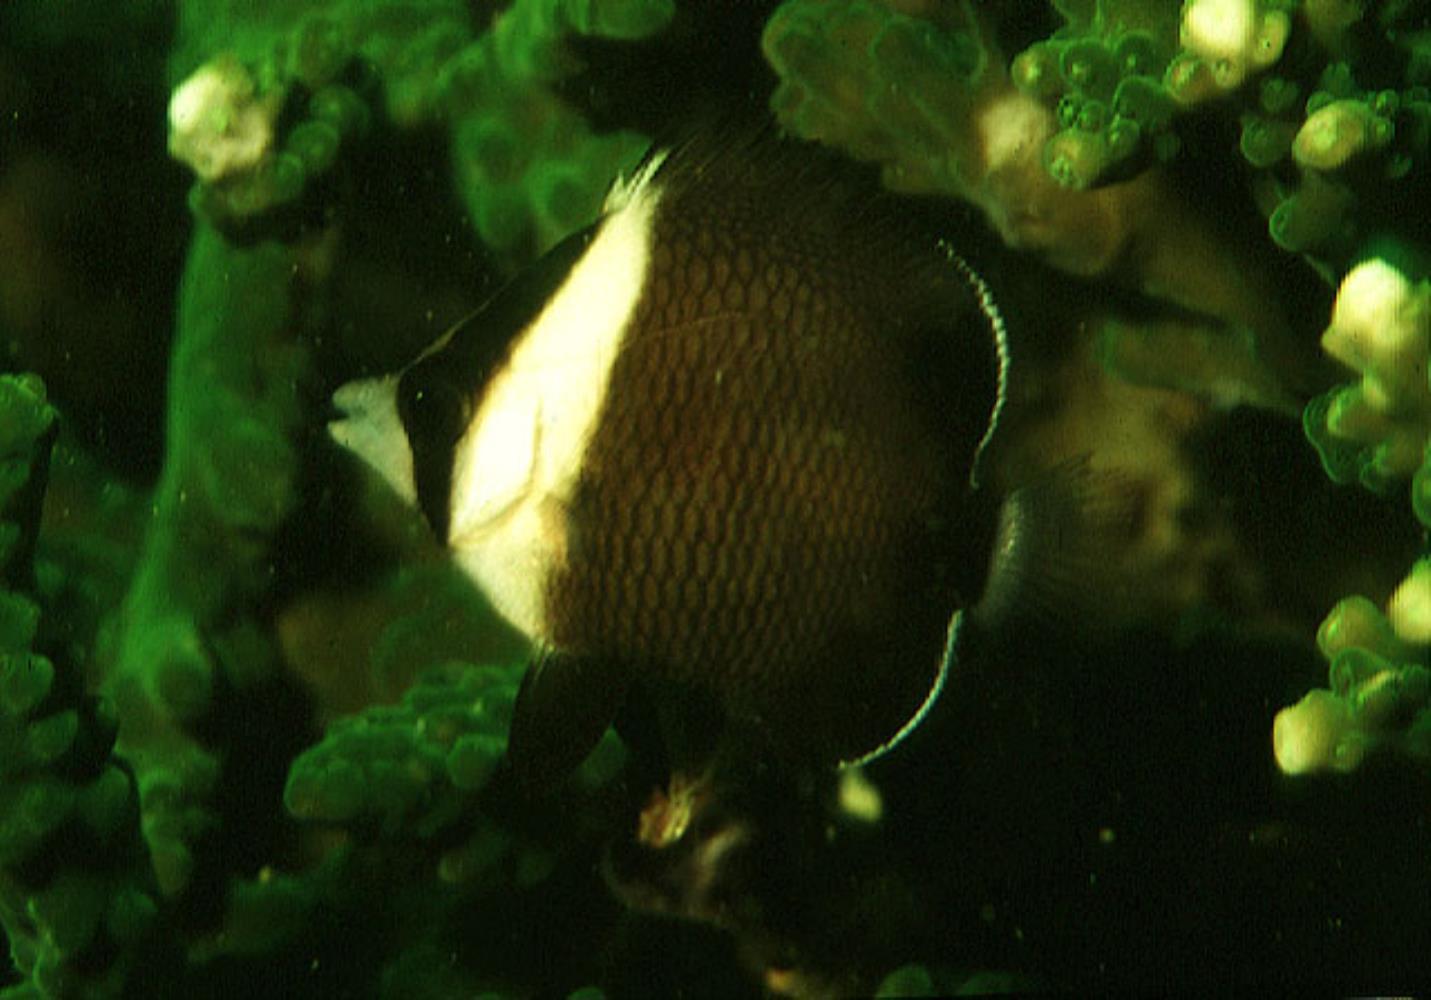 Oman Butterflyfish